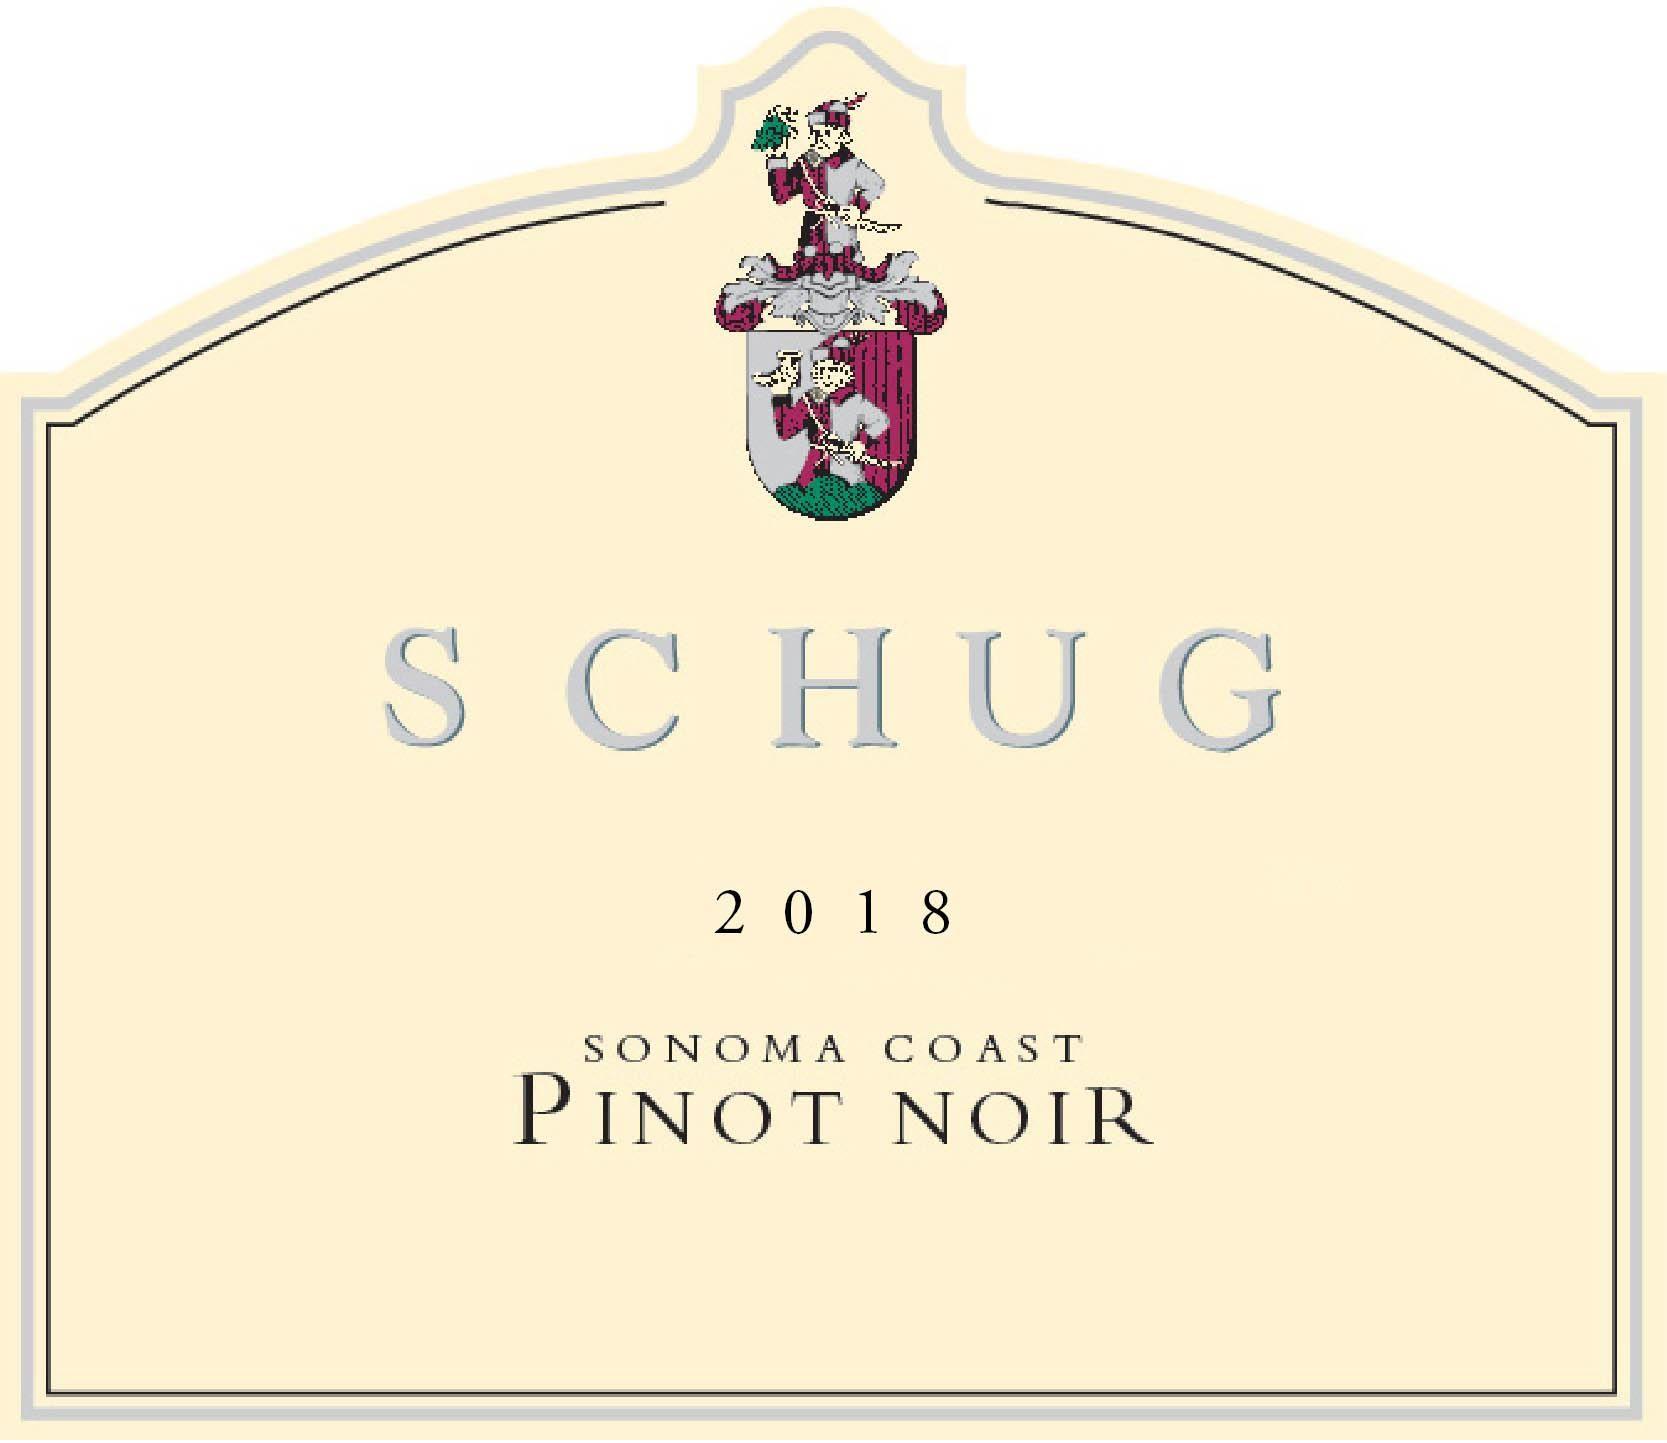 Schug Sonoma Coast Pinot Noir 2018